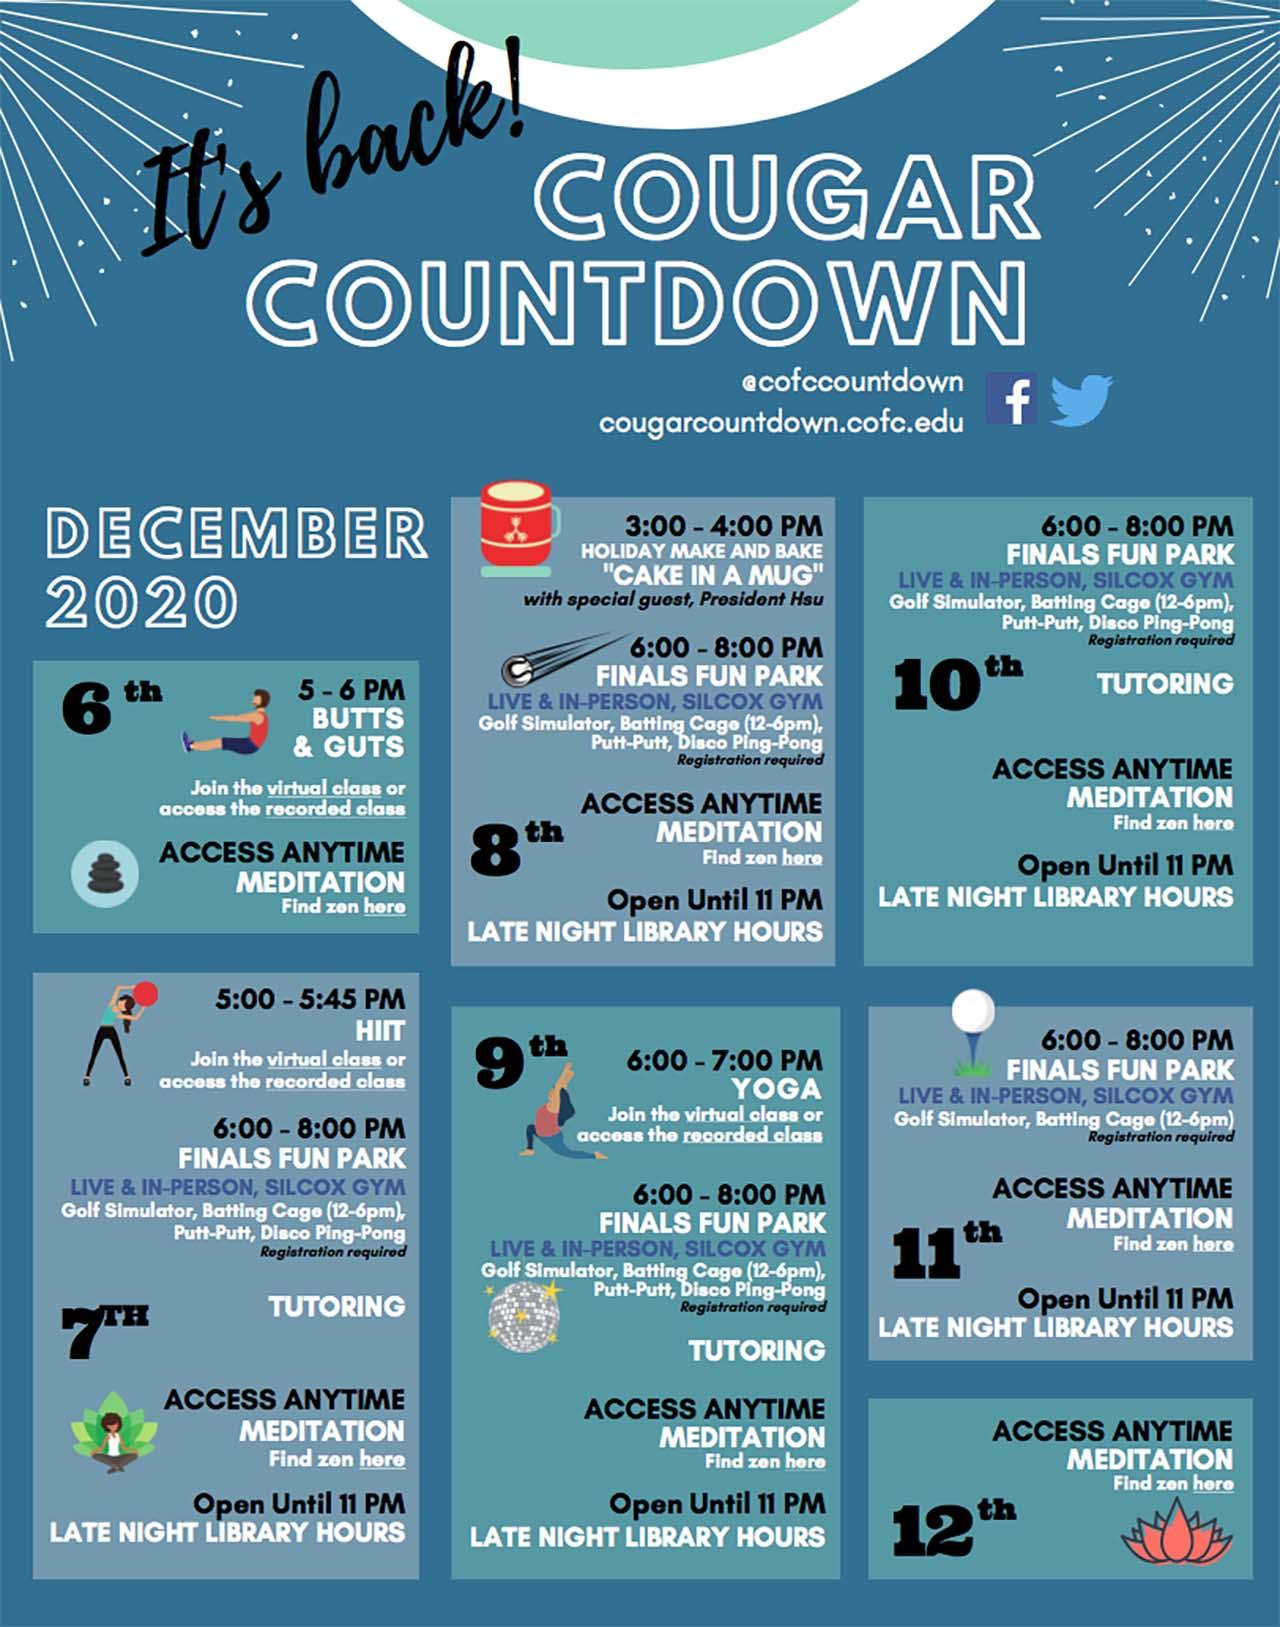 Cougar Countdown flyer